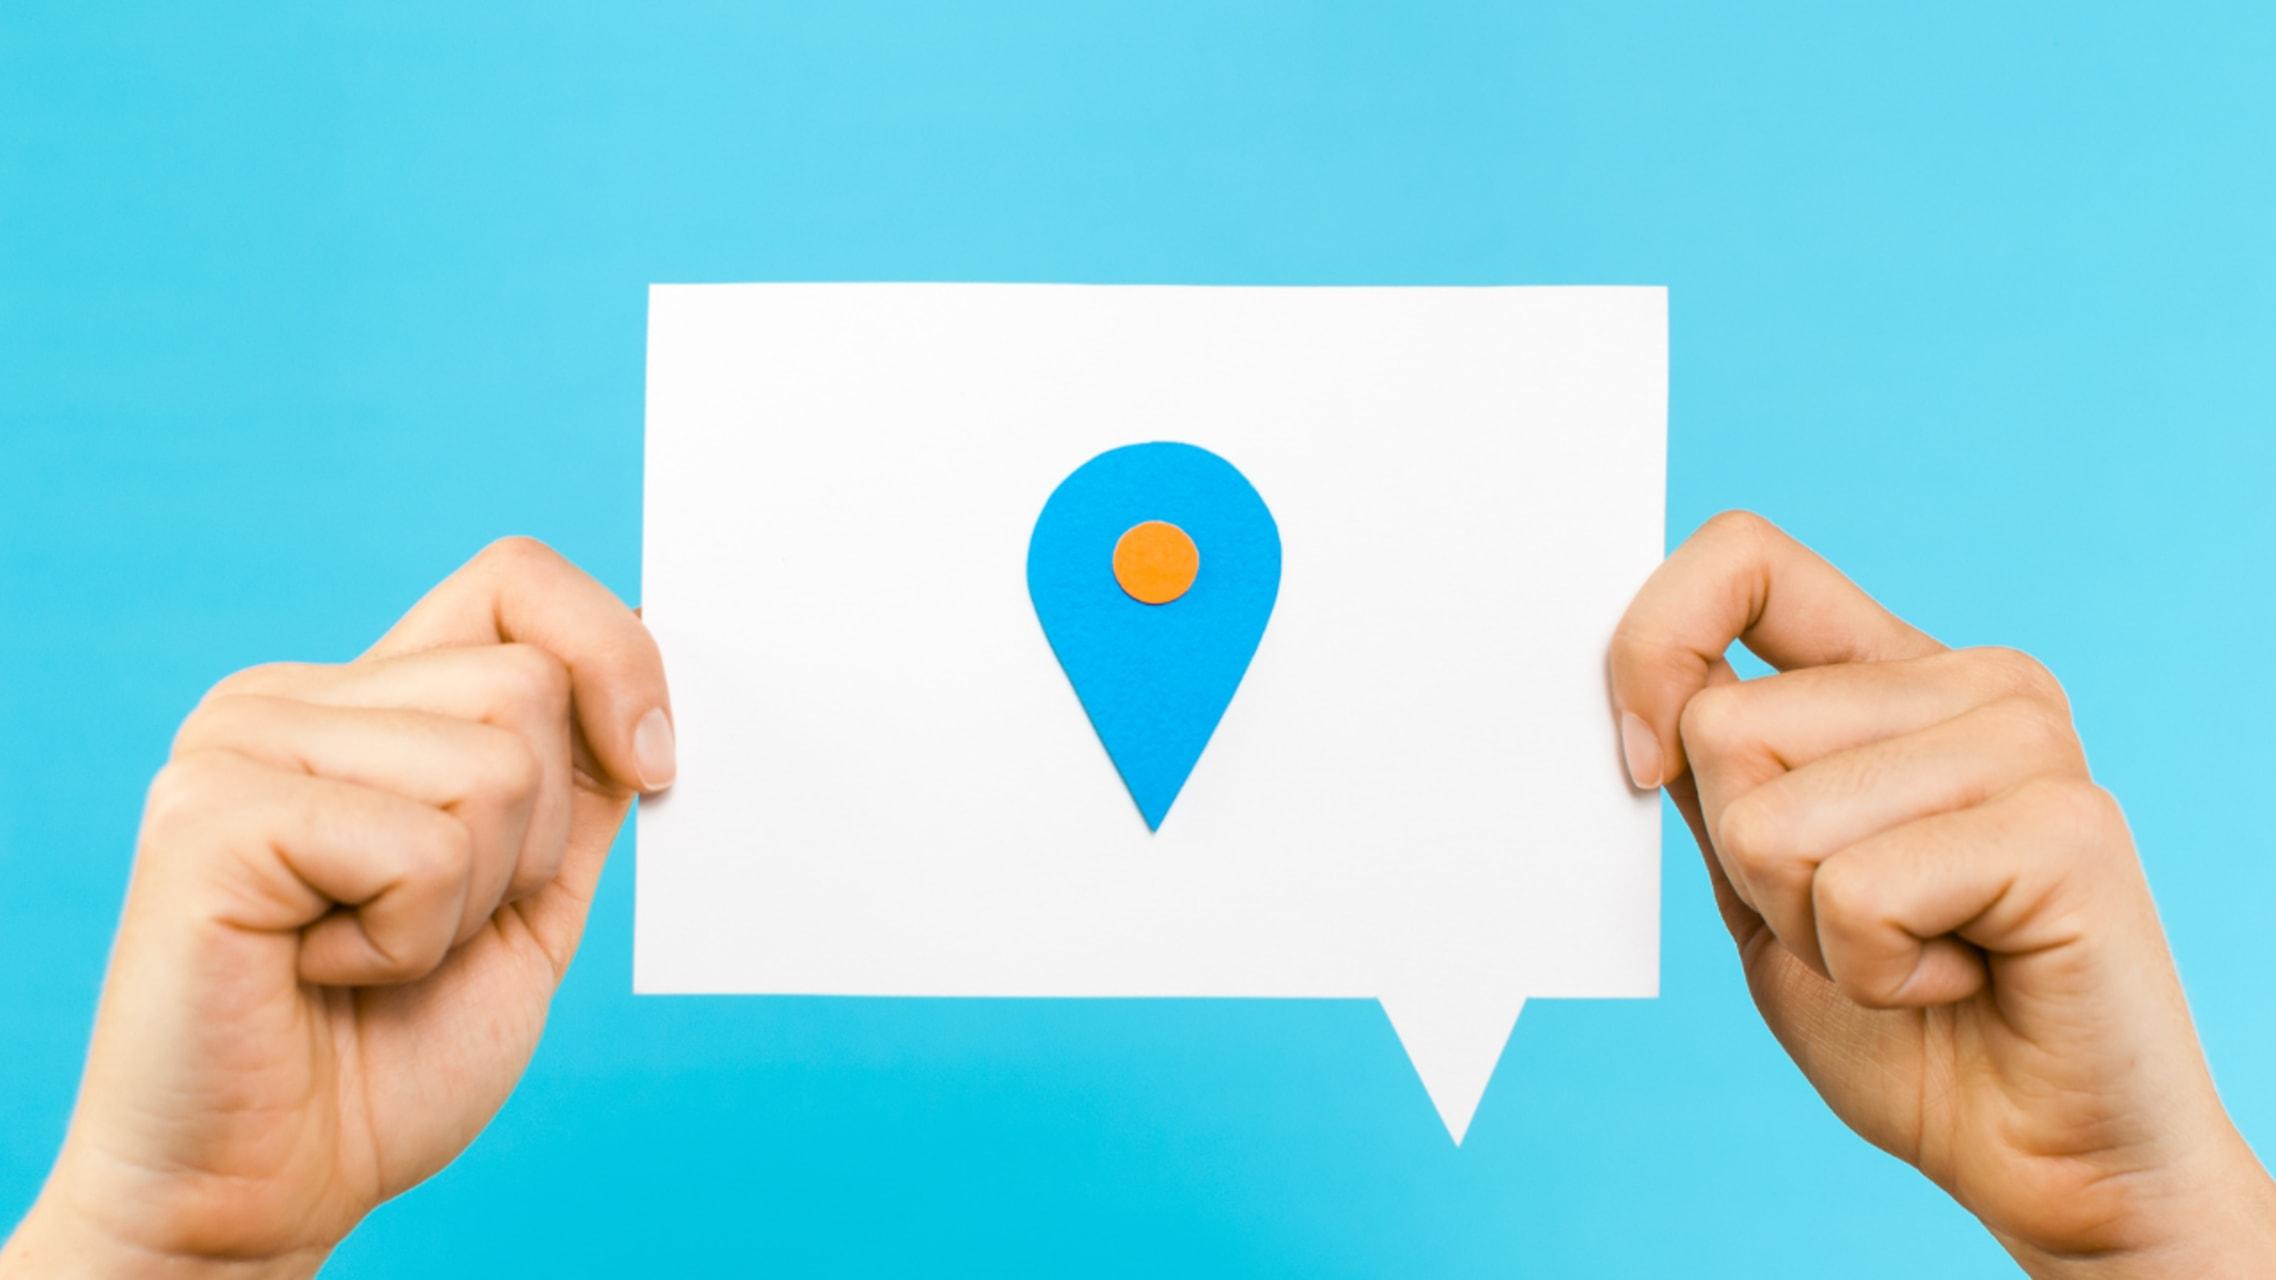 Hue - Hidden Huế: Where Are We?